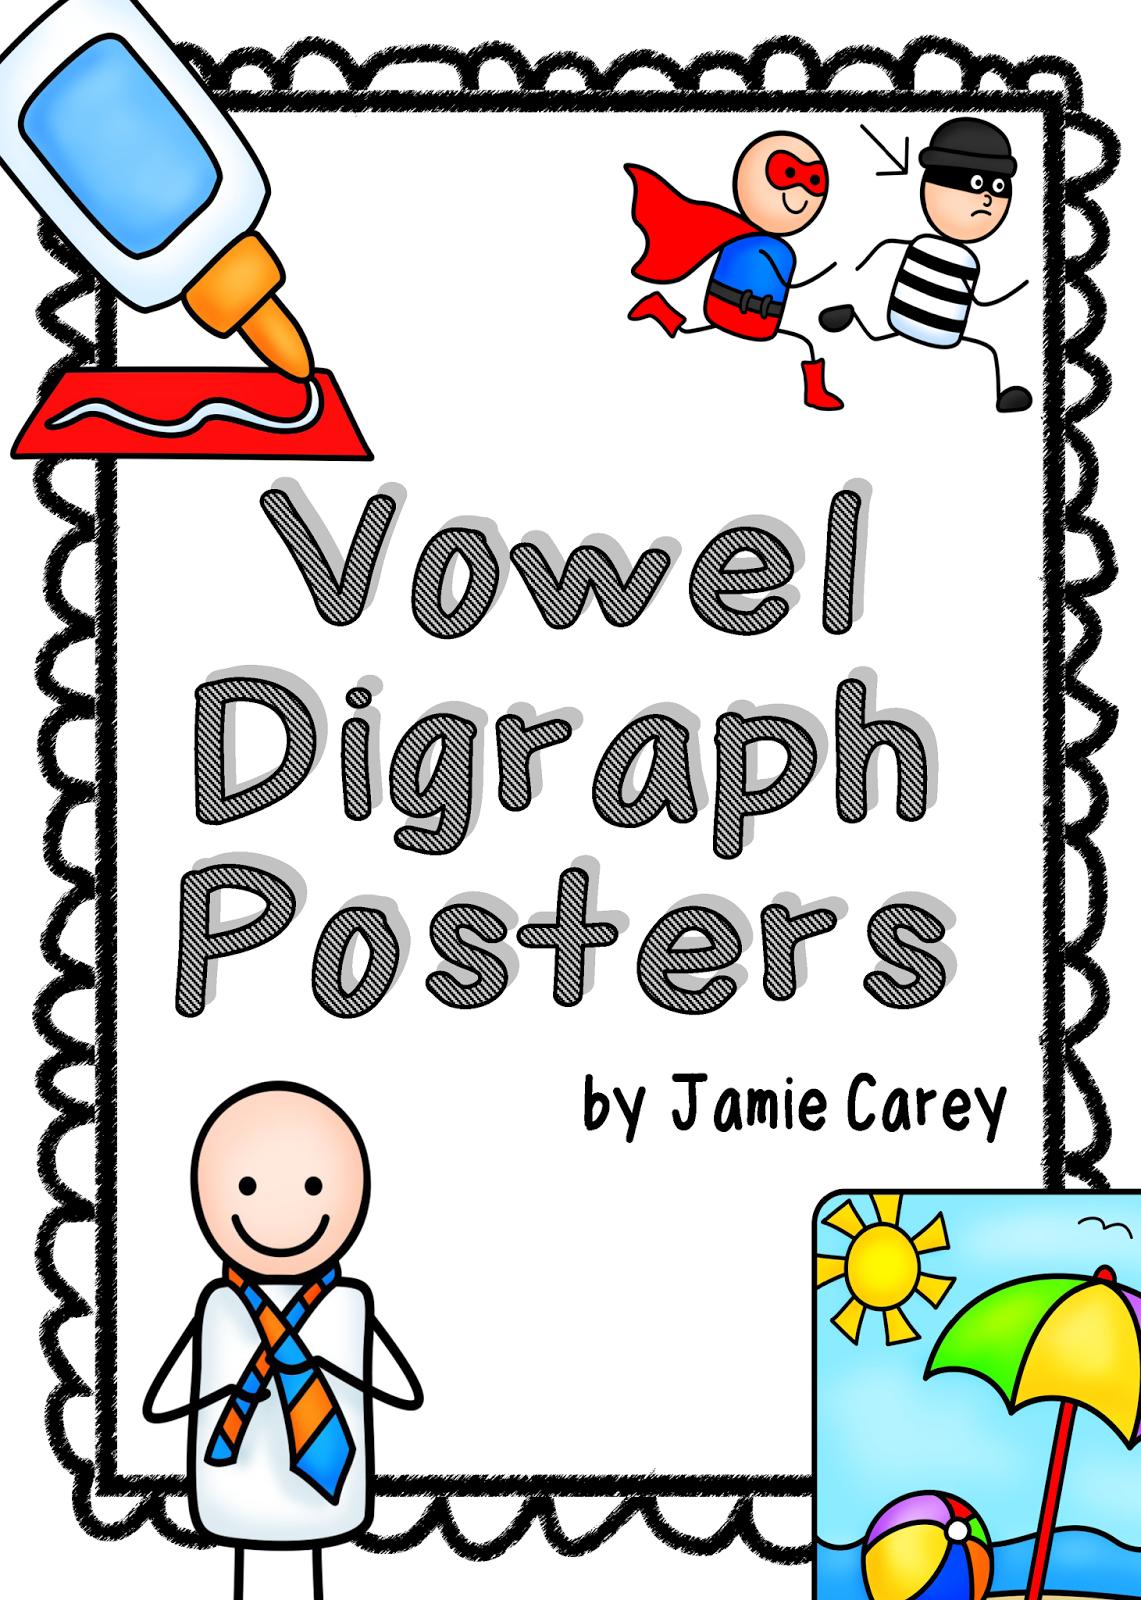 http://www.teacherspayteachers.com/Product/Vowel-Digraph-Posters-1329151